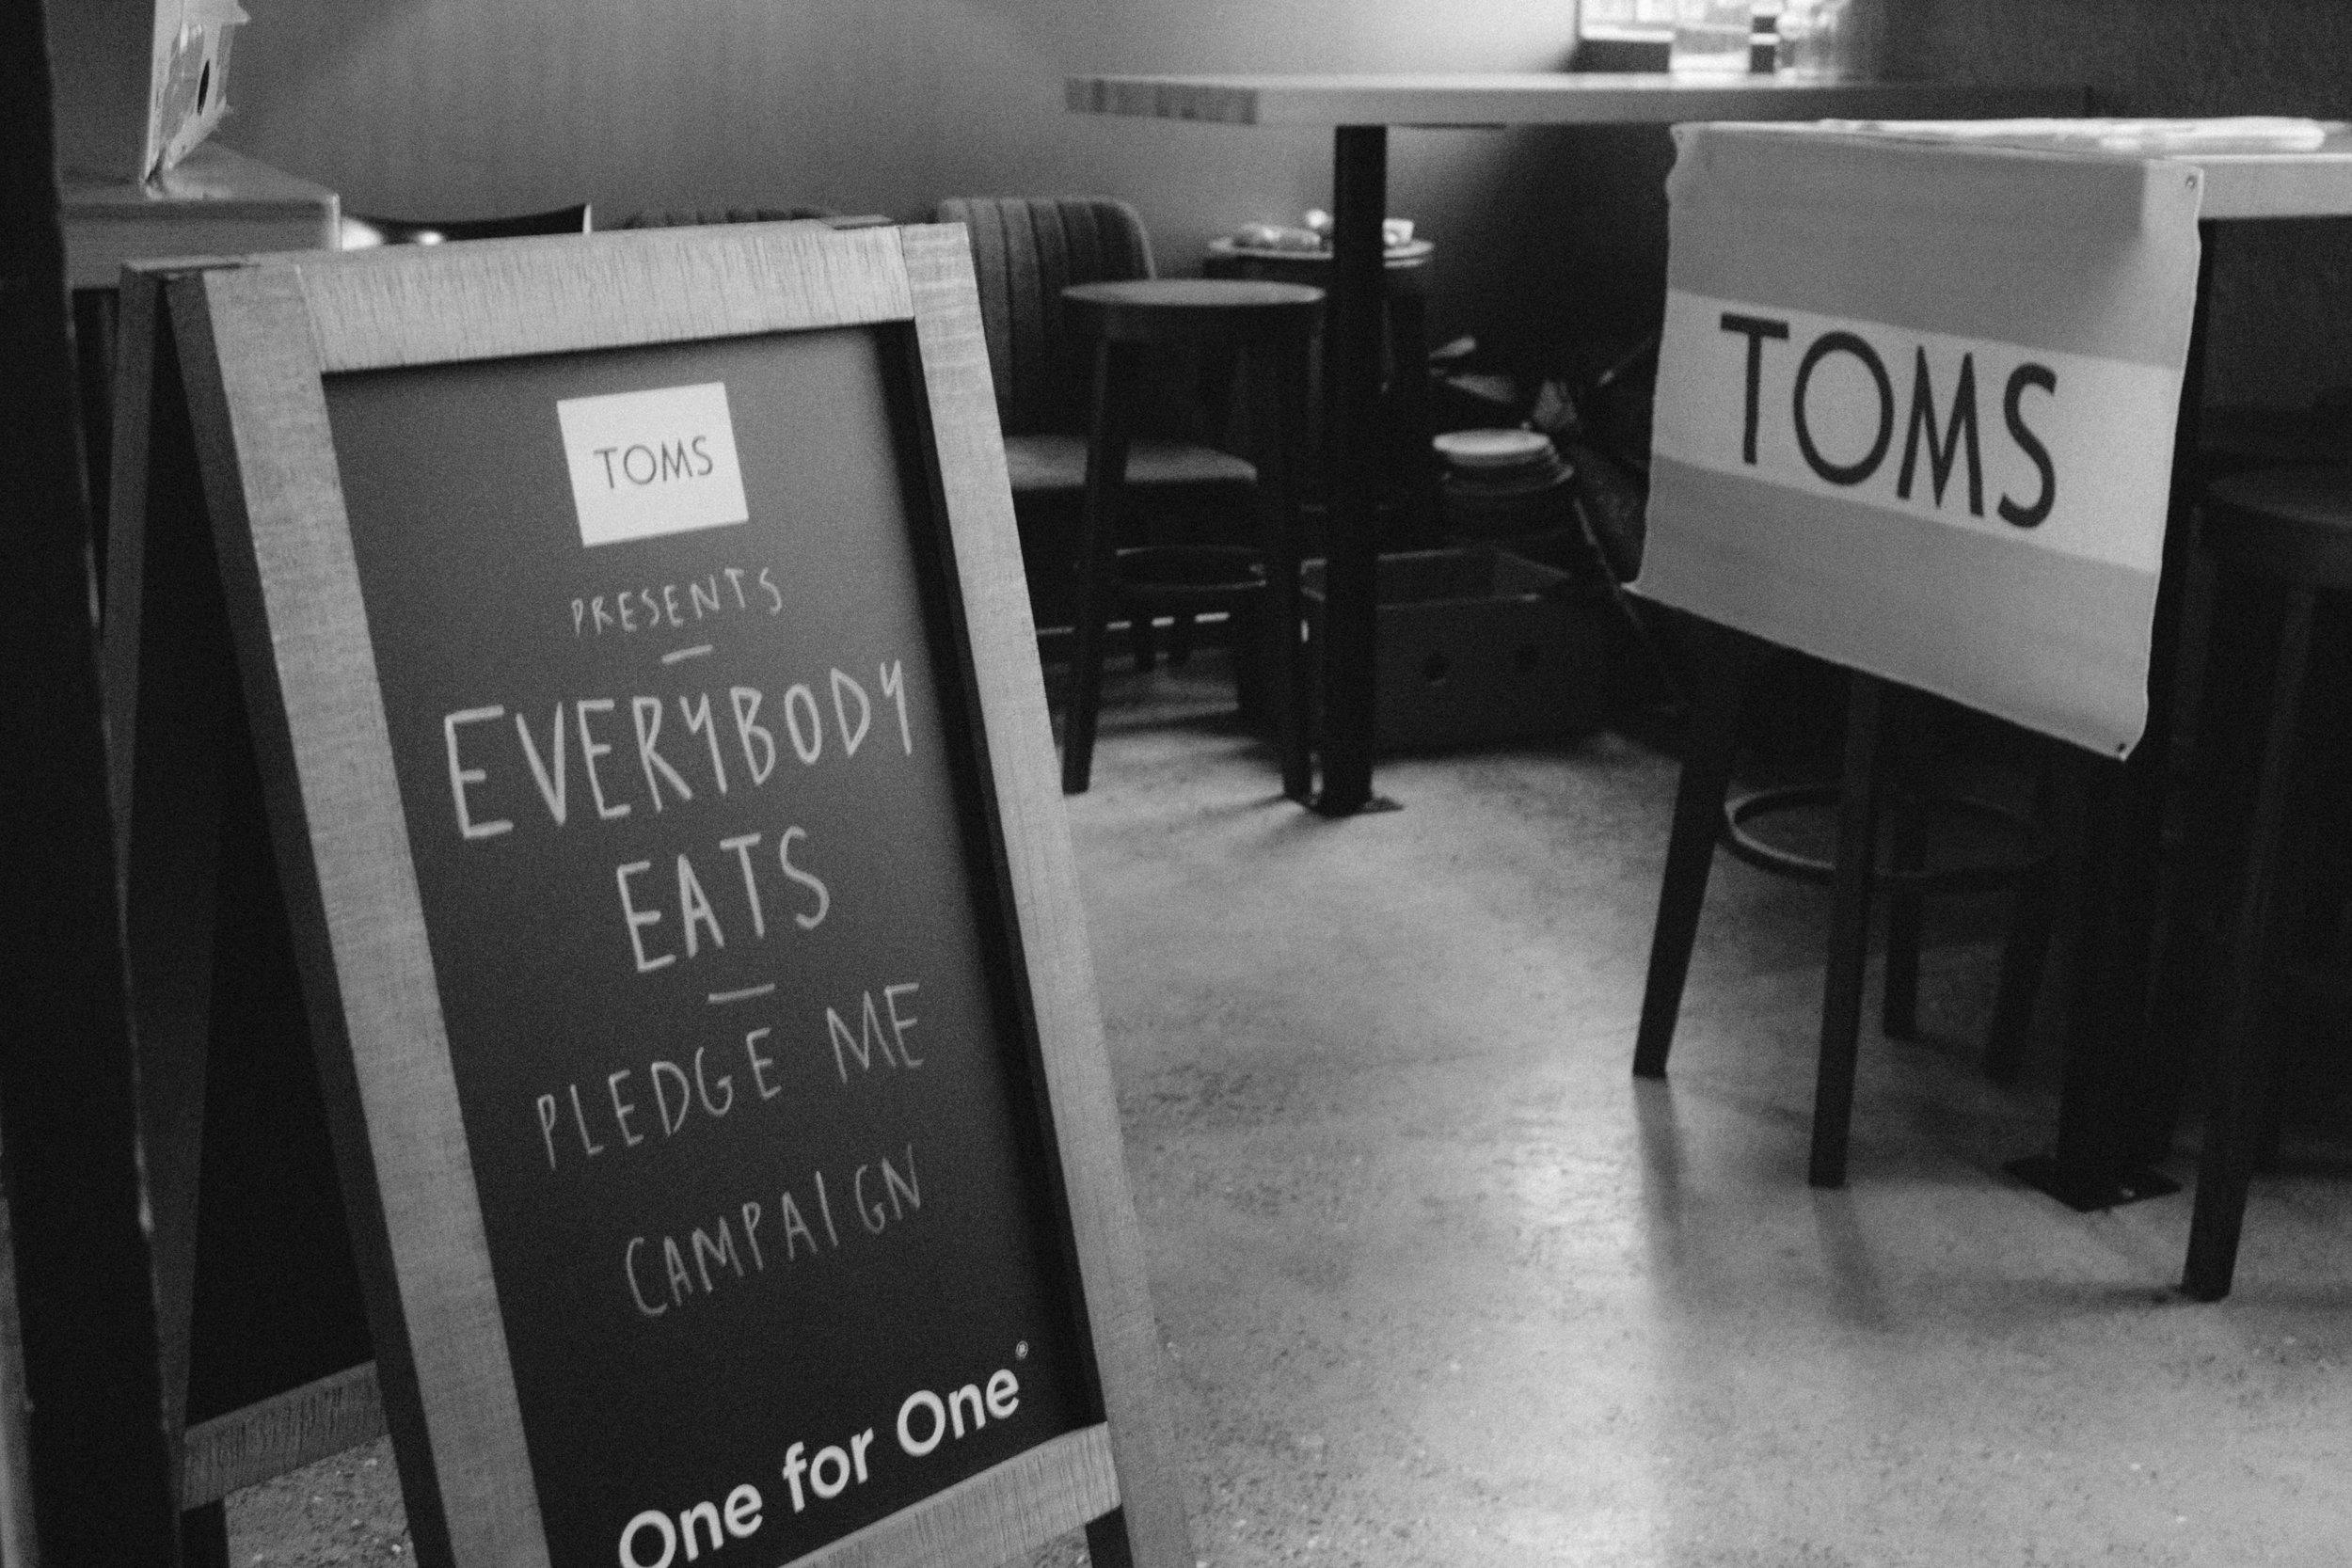 everybodyeats-011-1.jpg